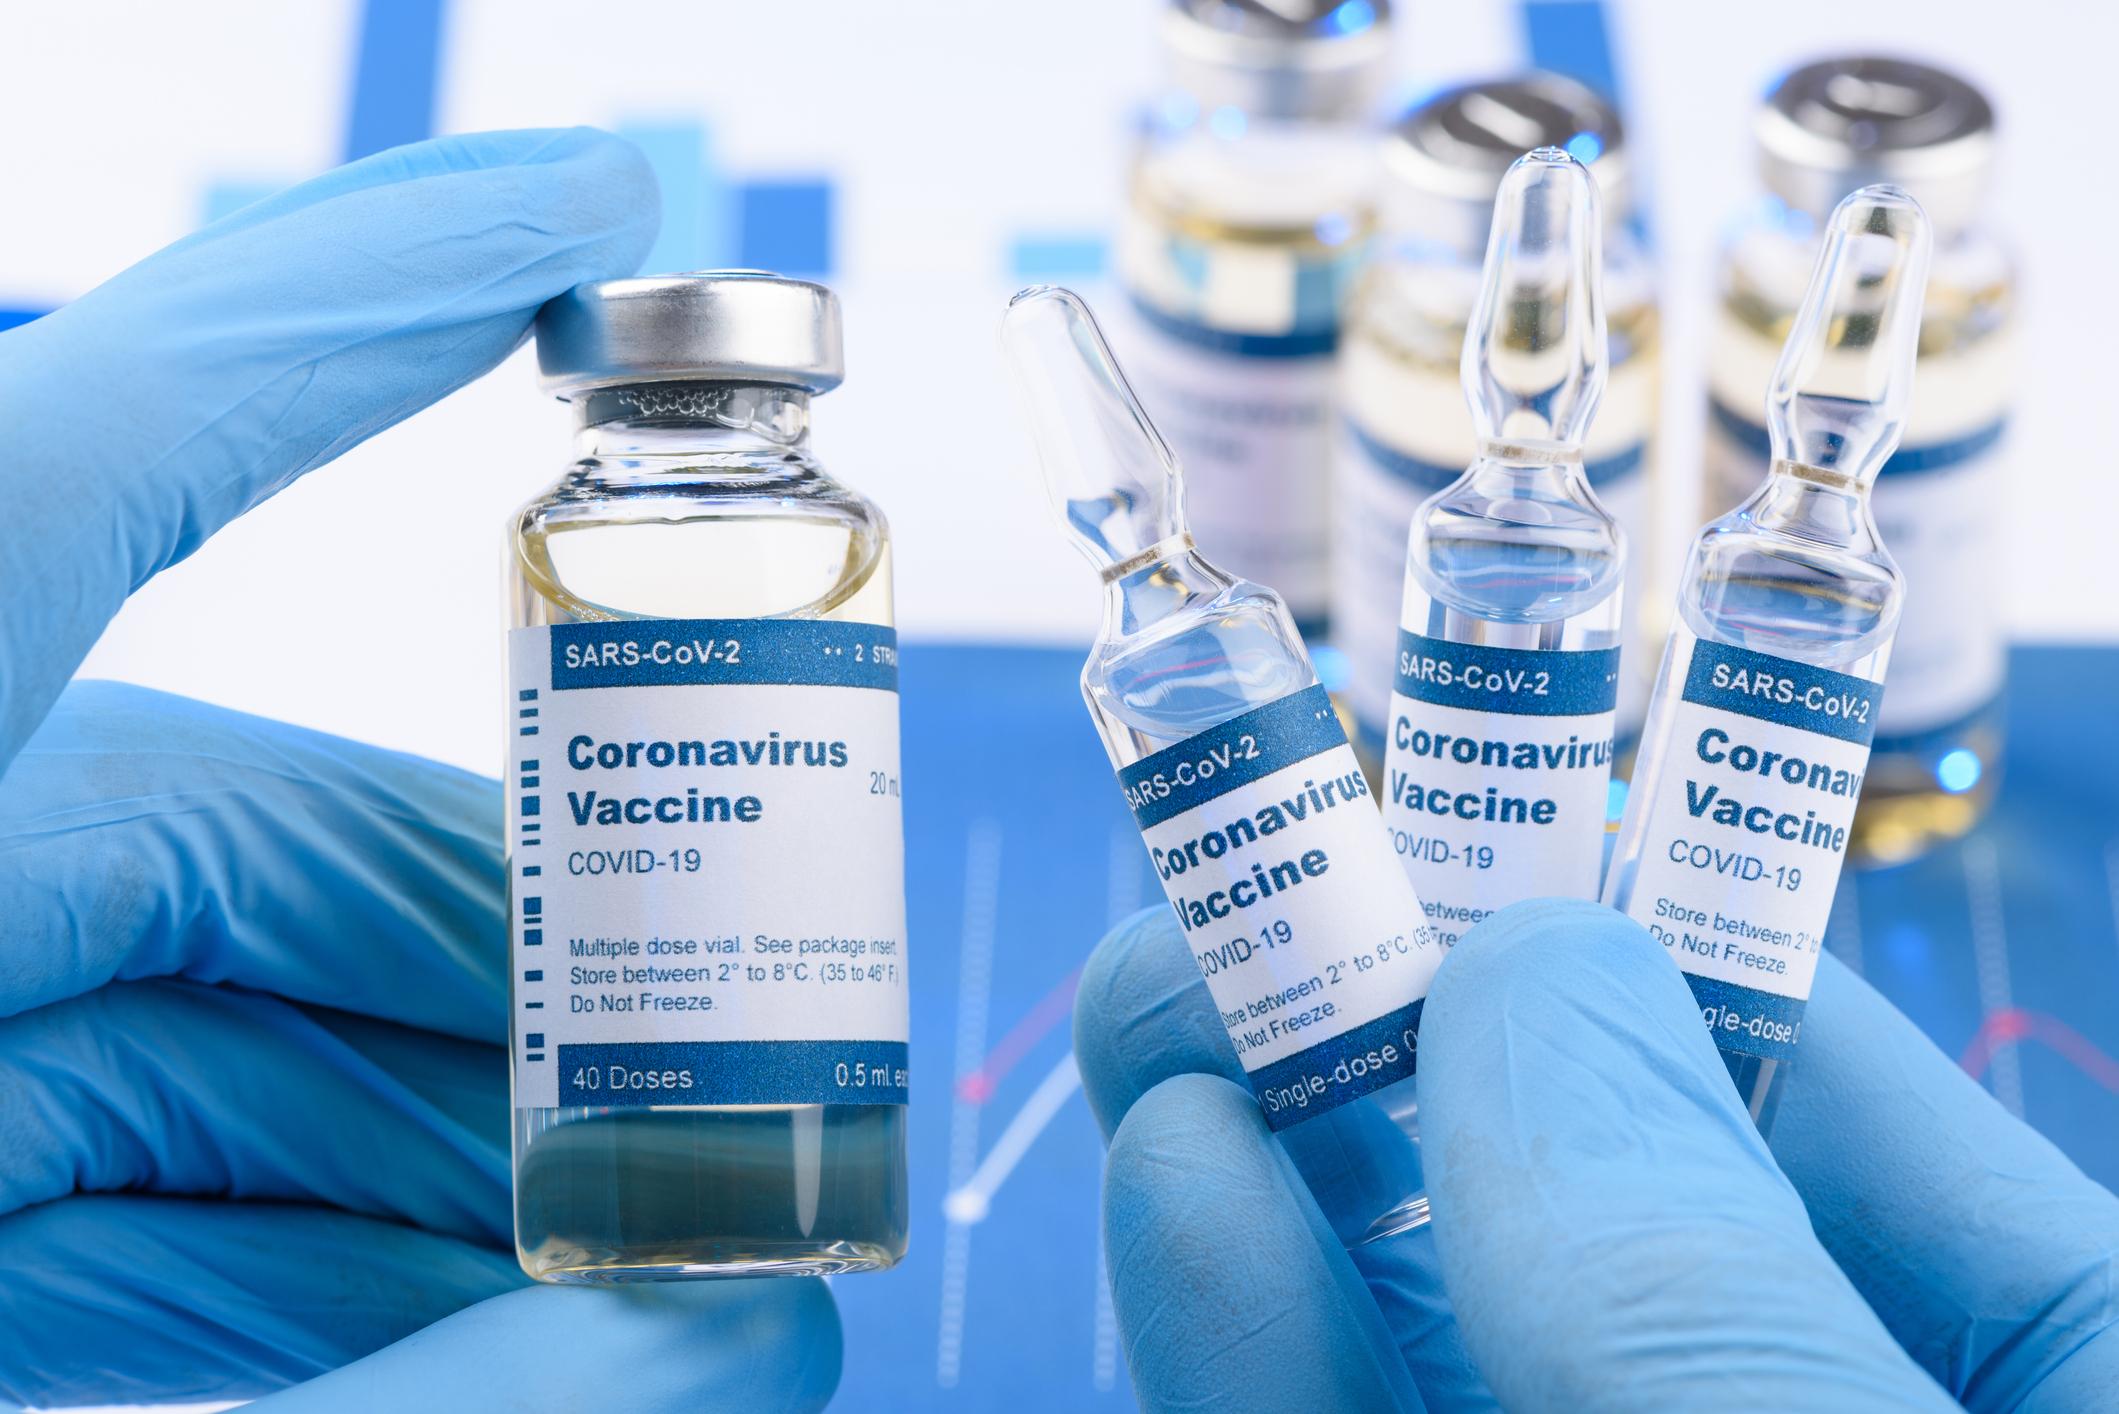 Report: Trump Administration Picks 5 Coronavirus Vaccine Candidates to Support - Motley Fool